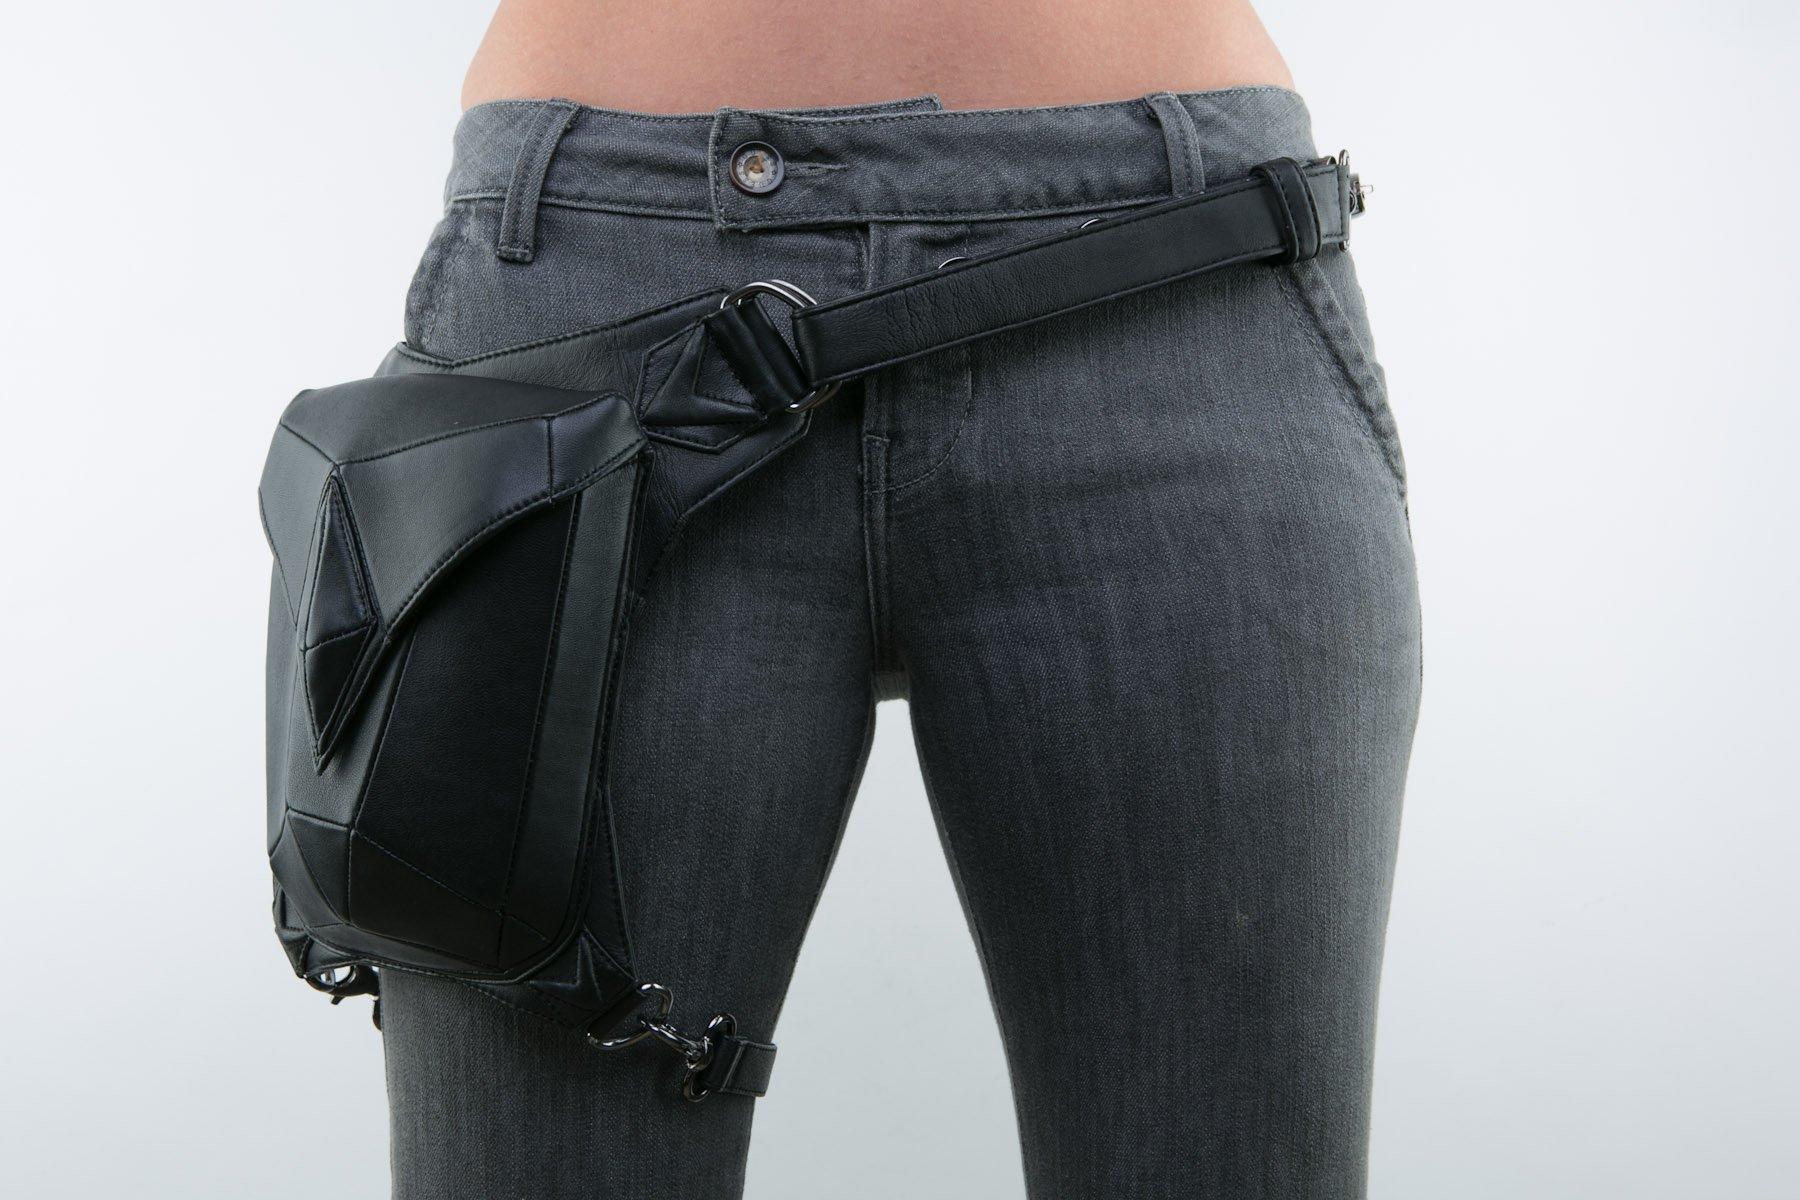 Metric Raven Hip Bag / Shoulder Holster / Cross-body Bag